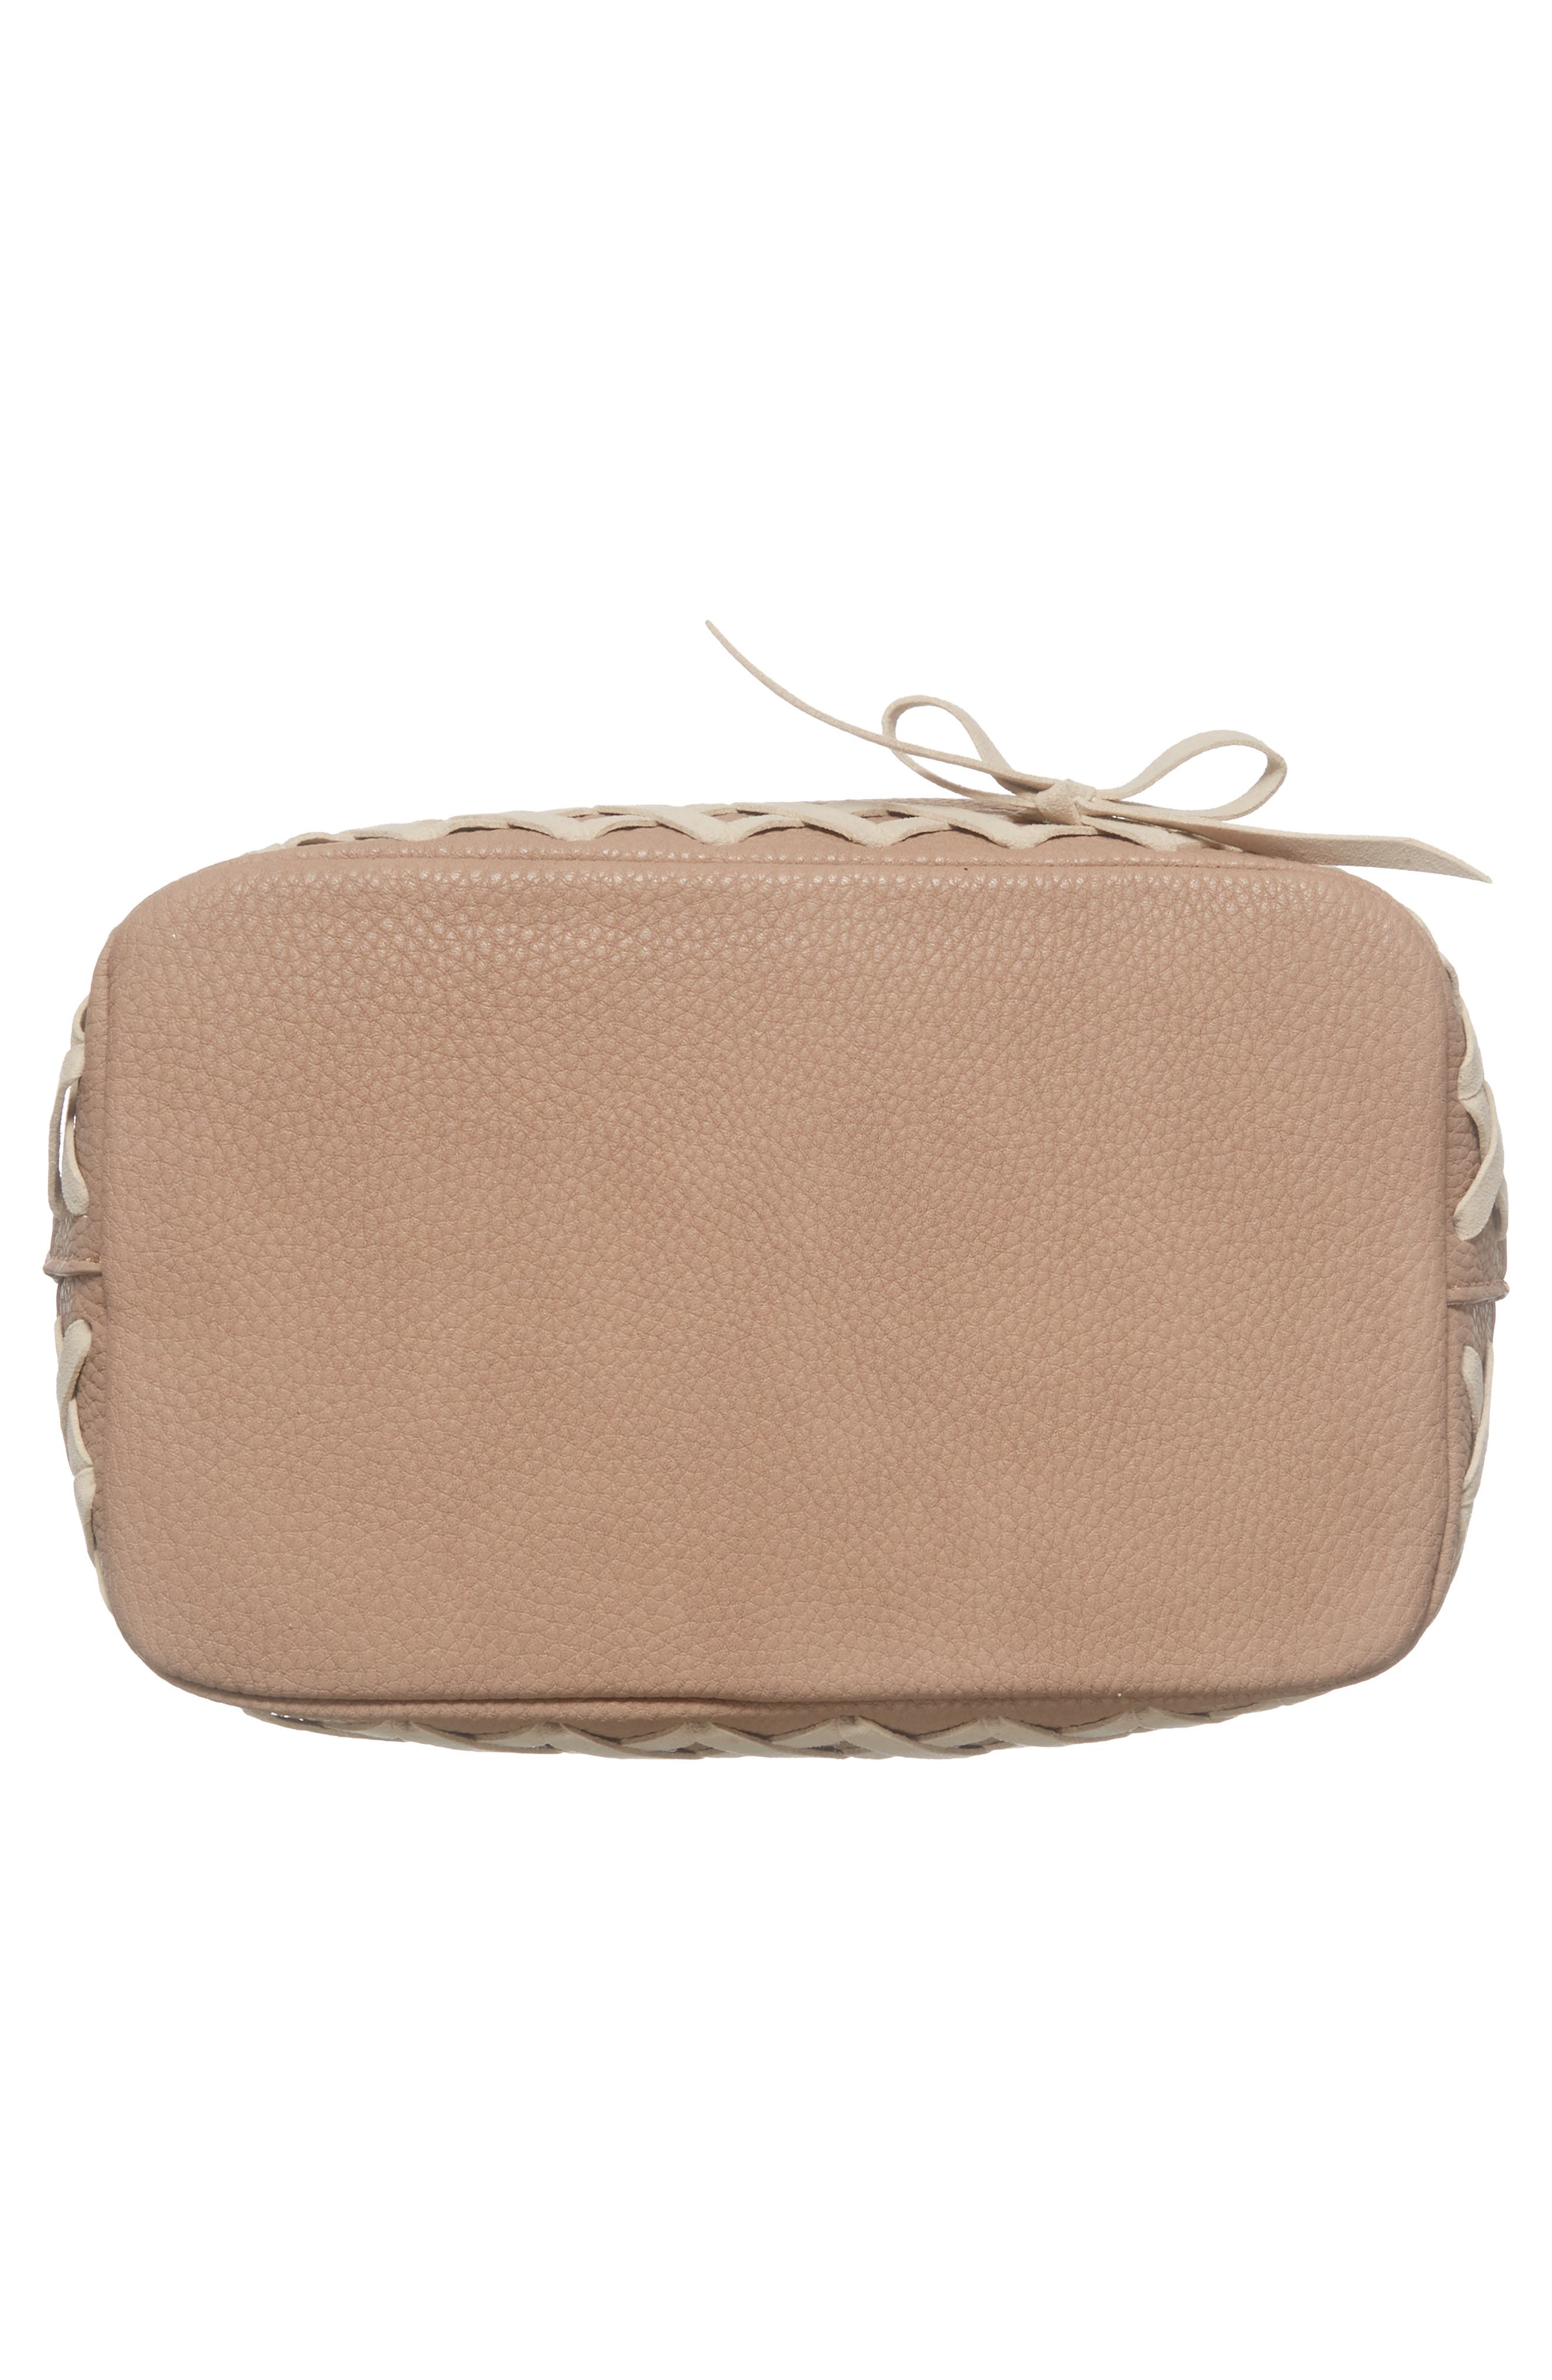 Veronica Faux Leather Bucket Bag,                             Alternate thumbnail 11, color,